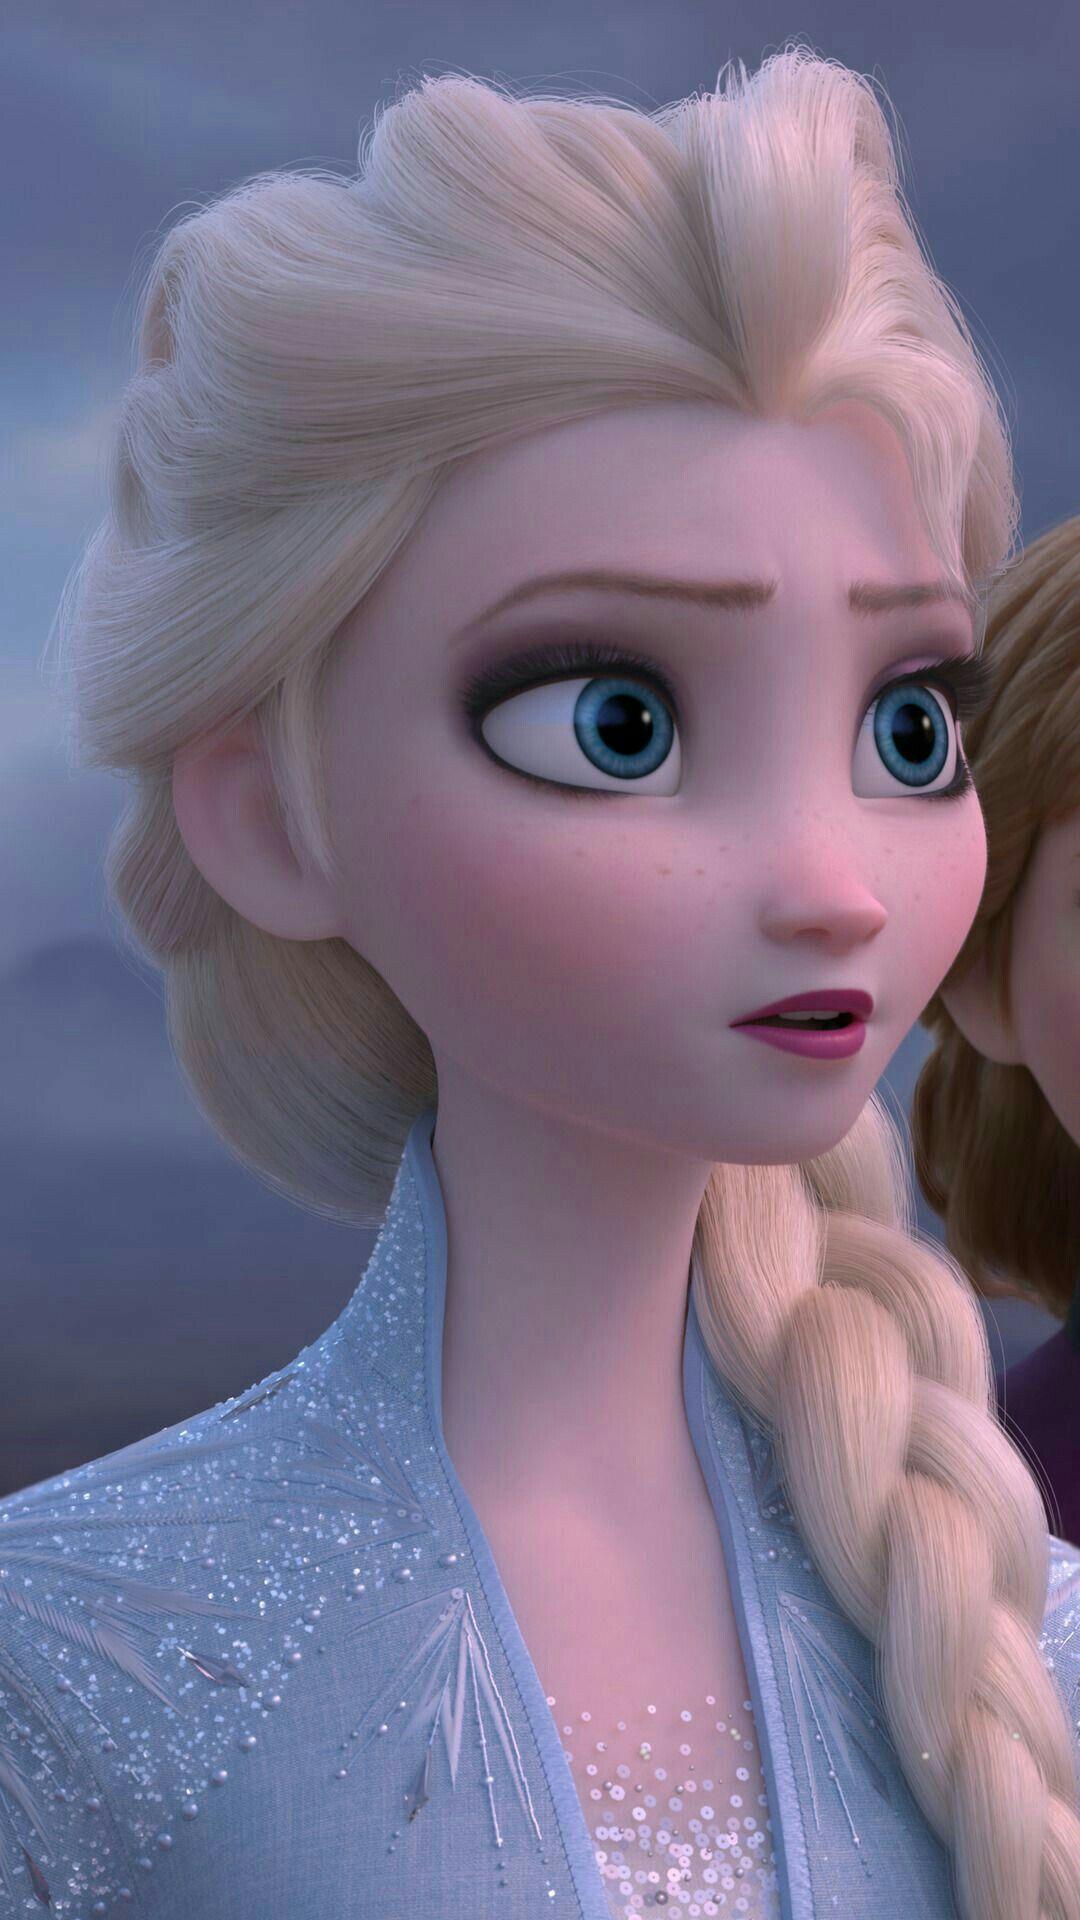 Pin By Hebah On Barbie Dpz Wallpaper Iphone Disney Princess Disney Princess Films Disney Princess Frozen